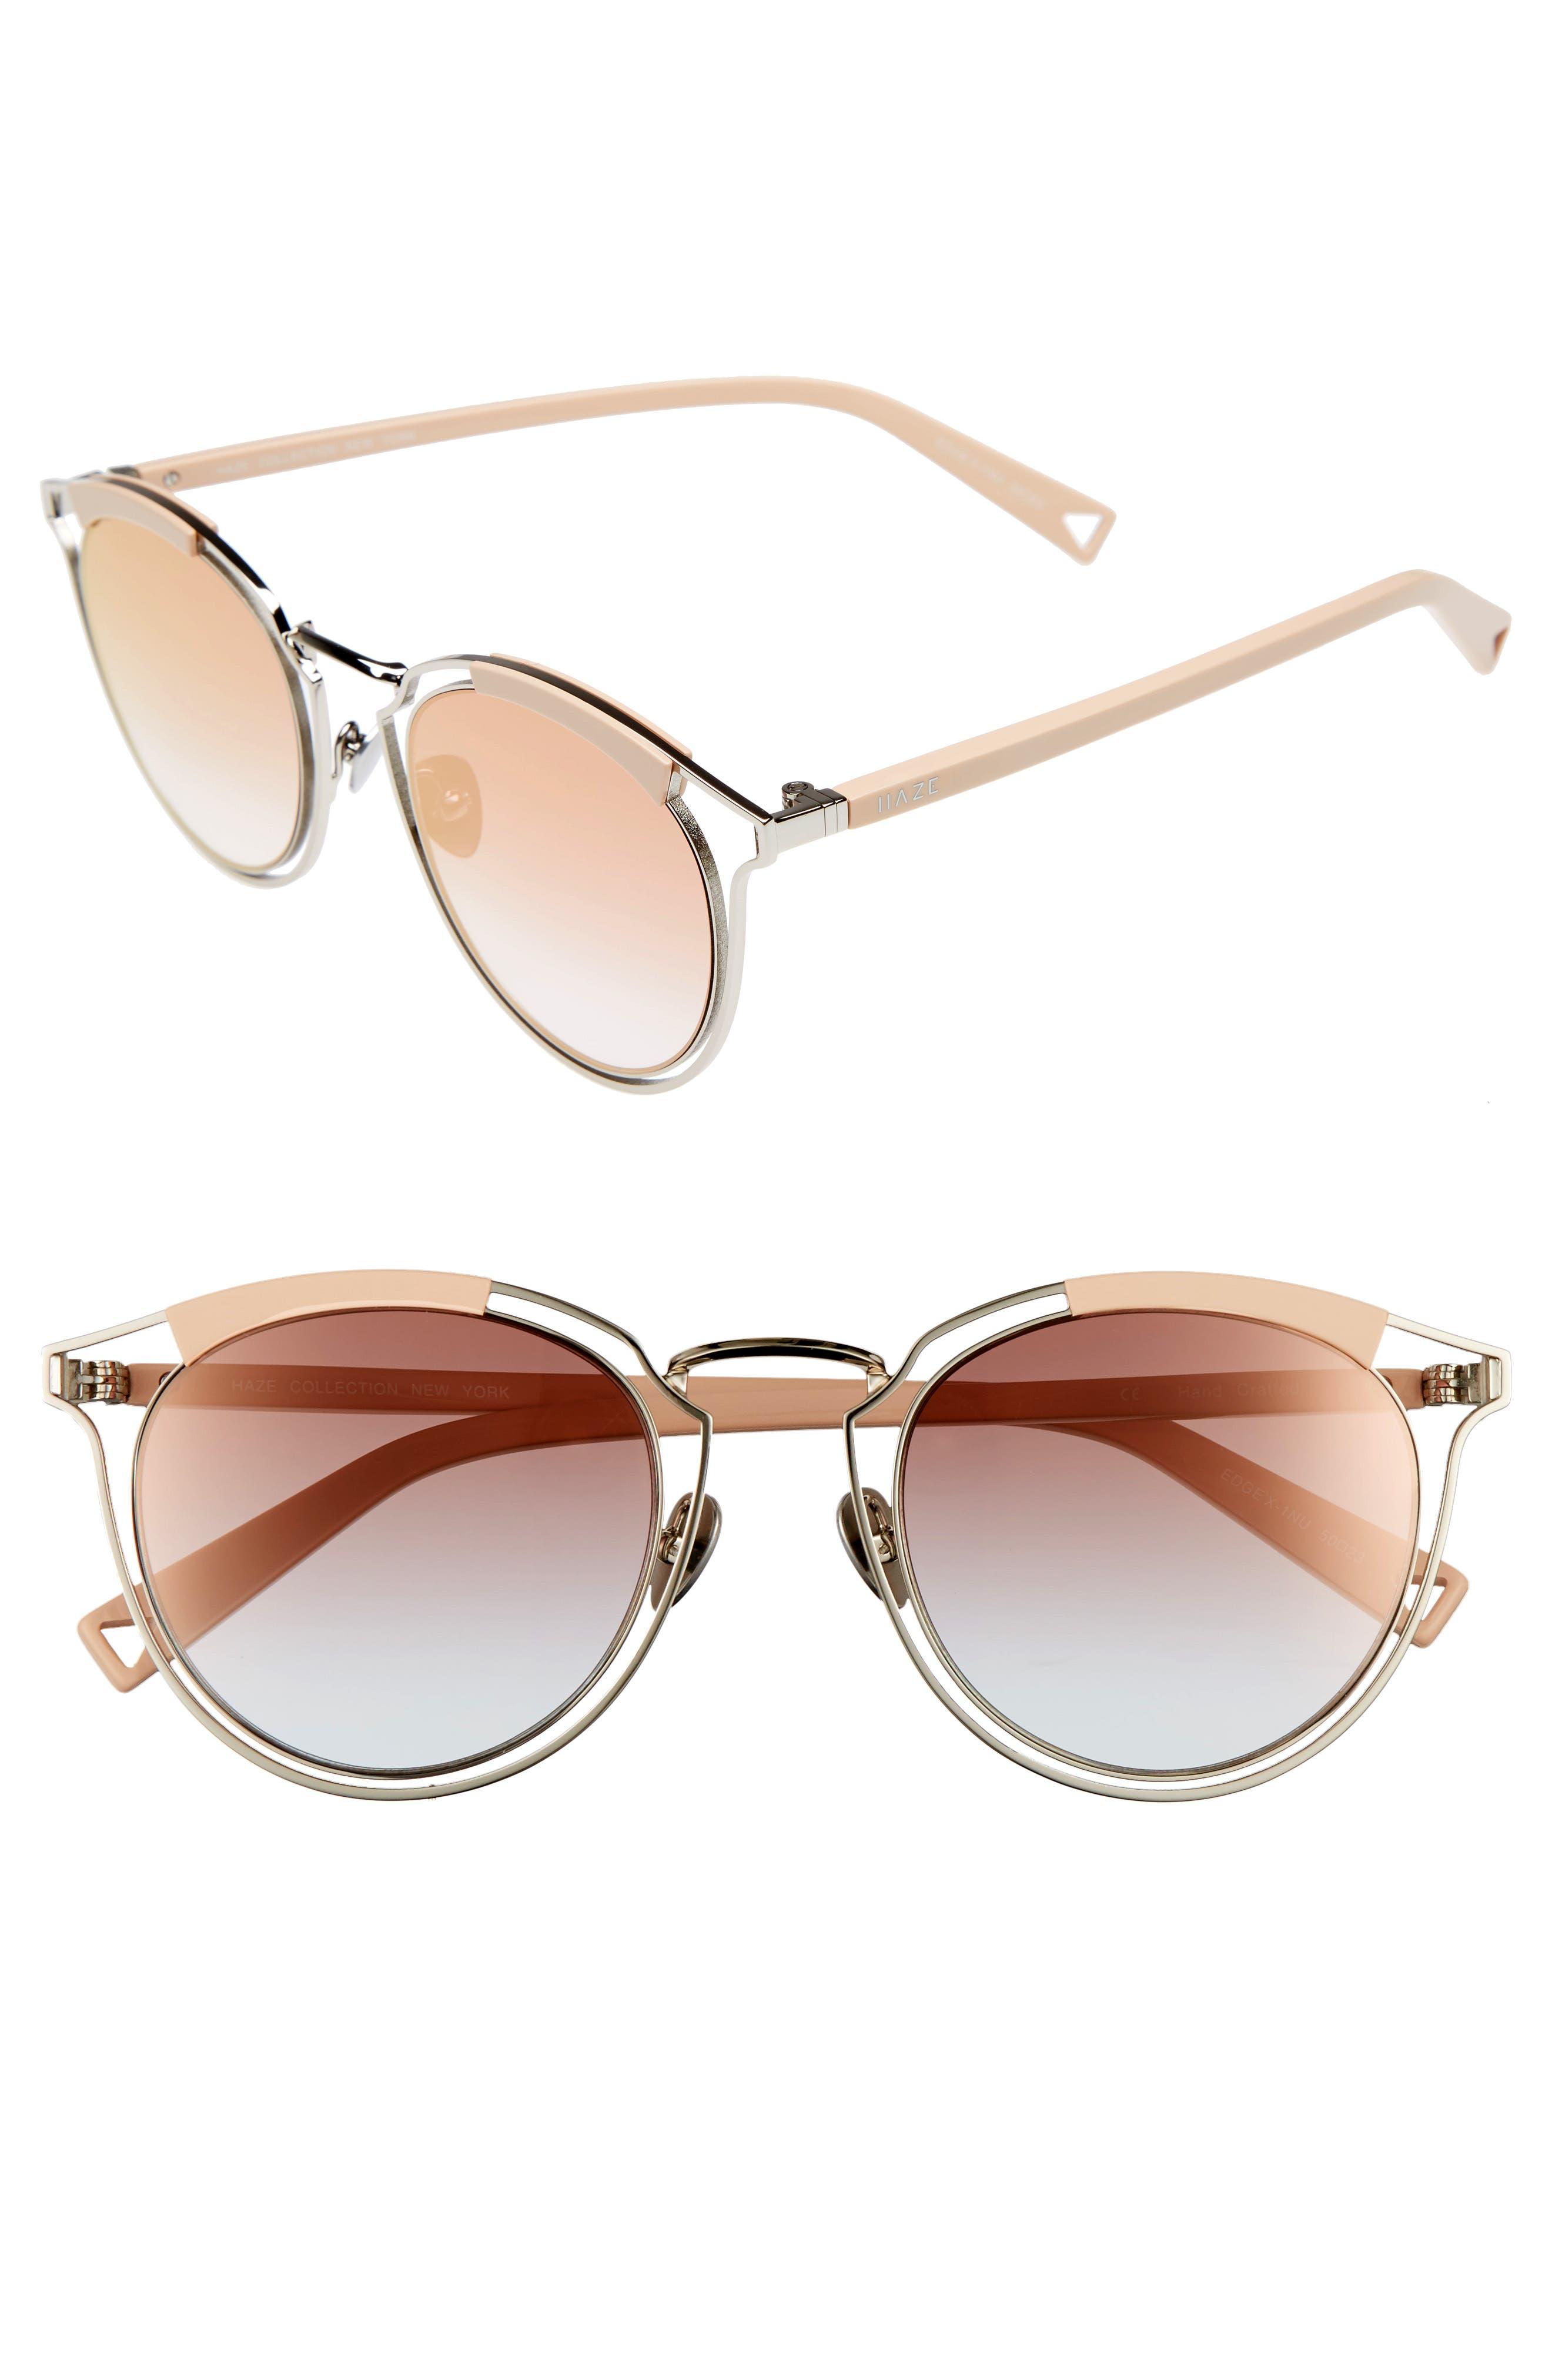 Edge X 50mm Modified Round Sunglasses,                             Main thumbnail 1, color,                             040